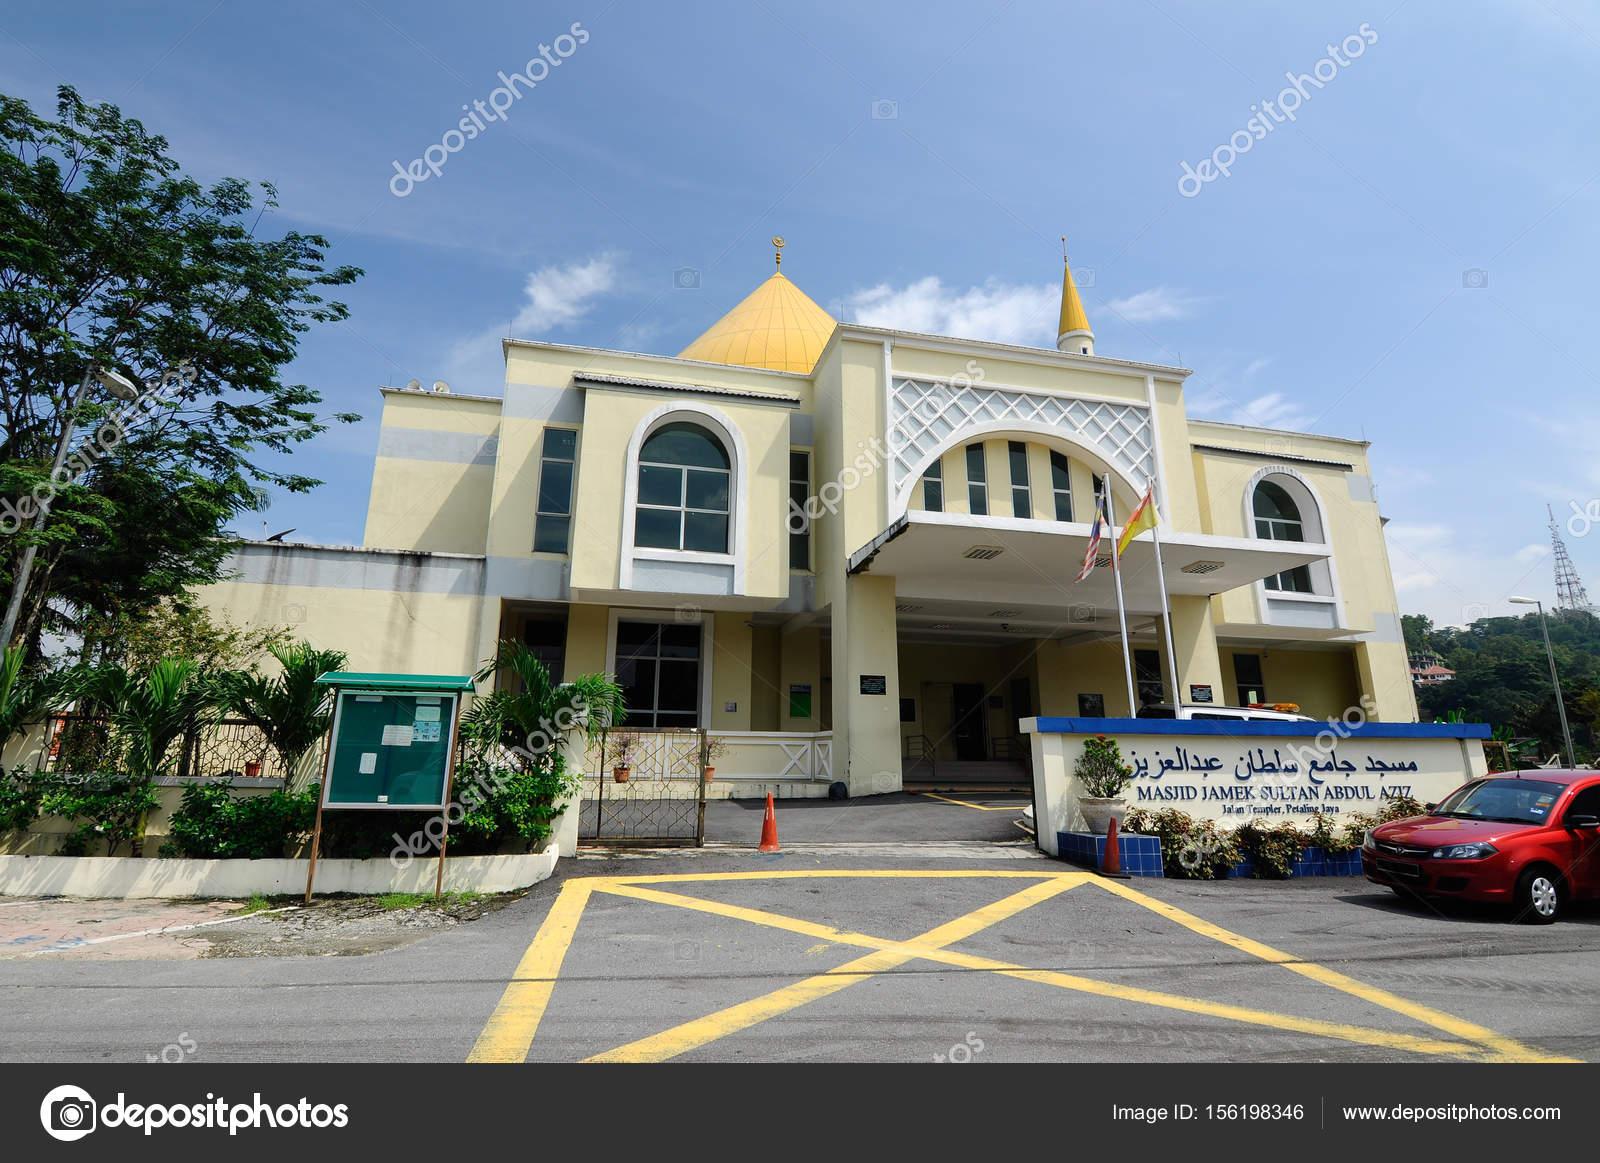 Exterior Masjid Jamek Sultan Abdul Aziz Petaling Jaya Malaysia Modern Stock Editorial Photo C Aisyaqilumar 156198346